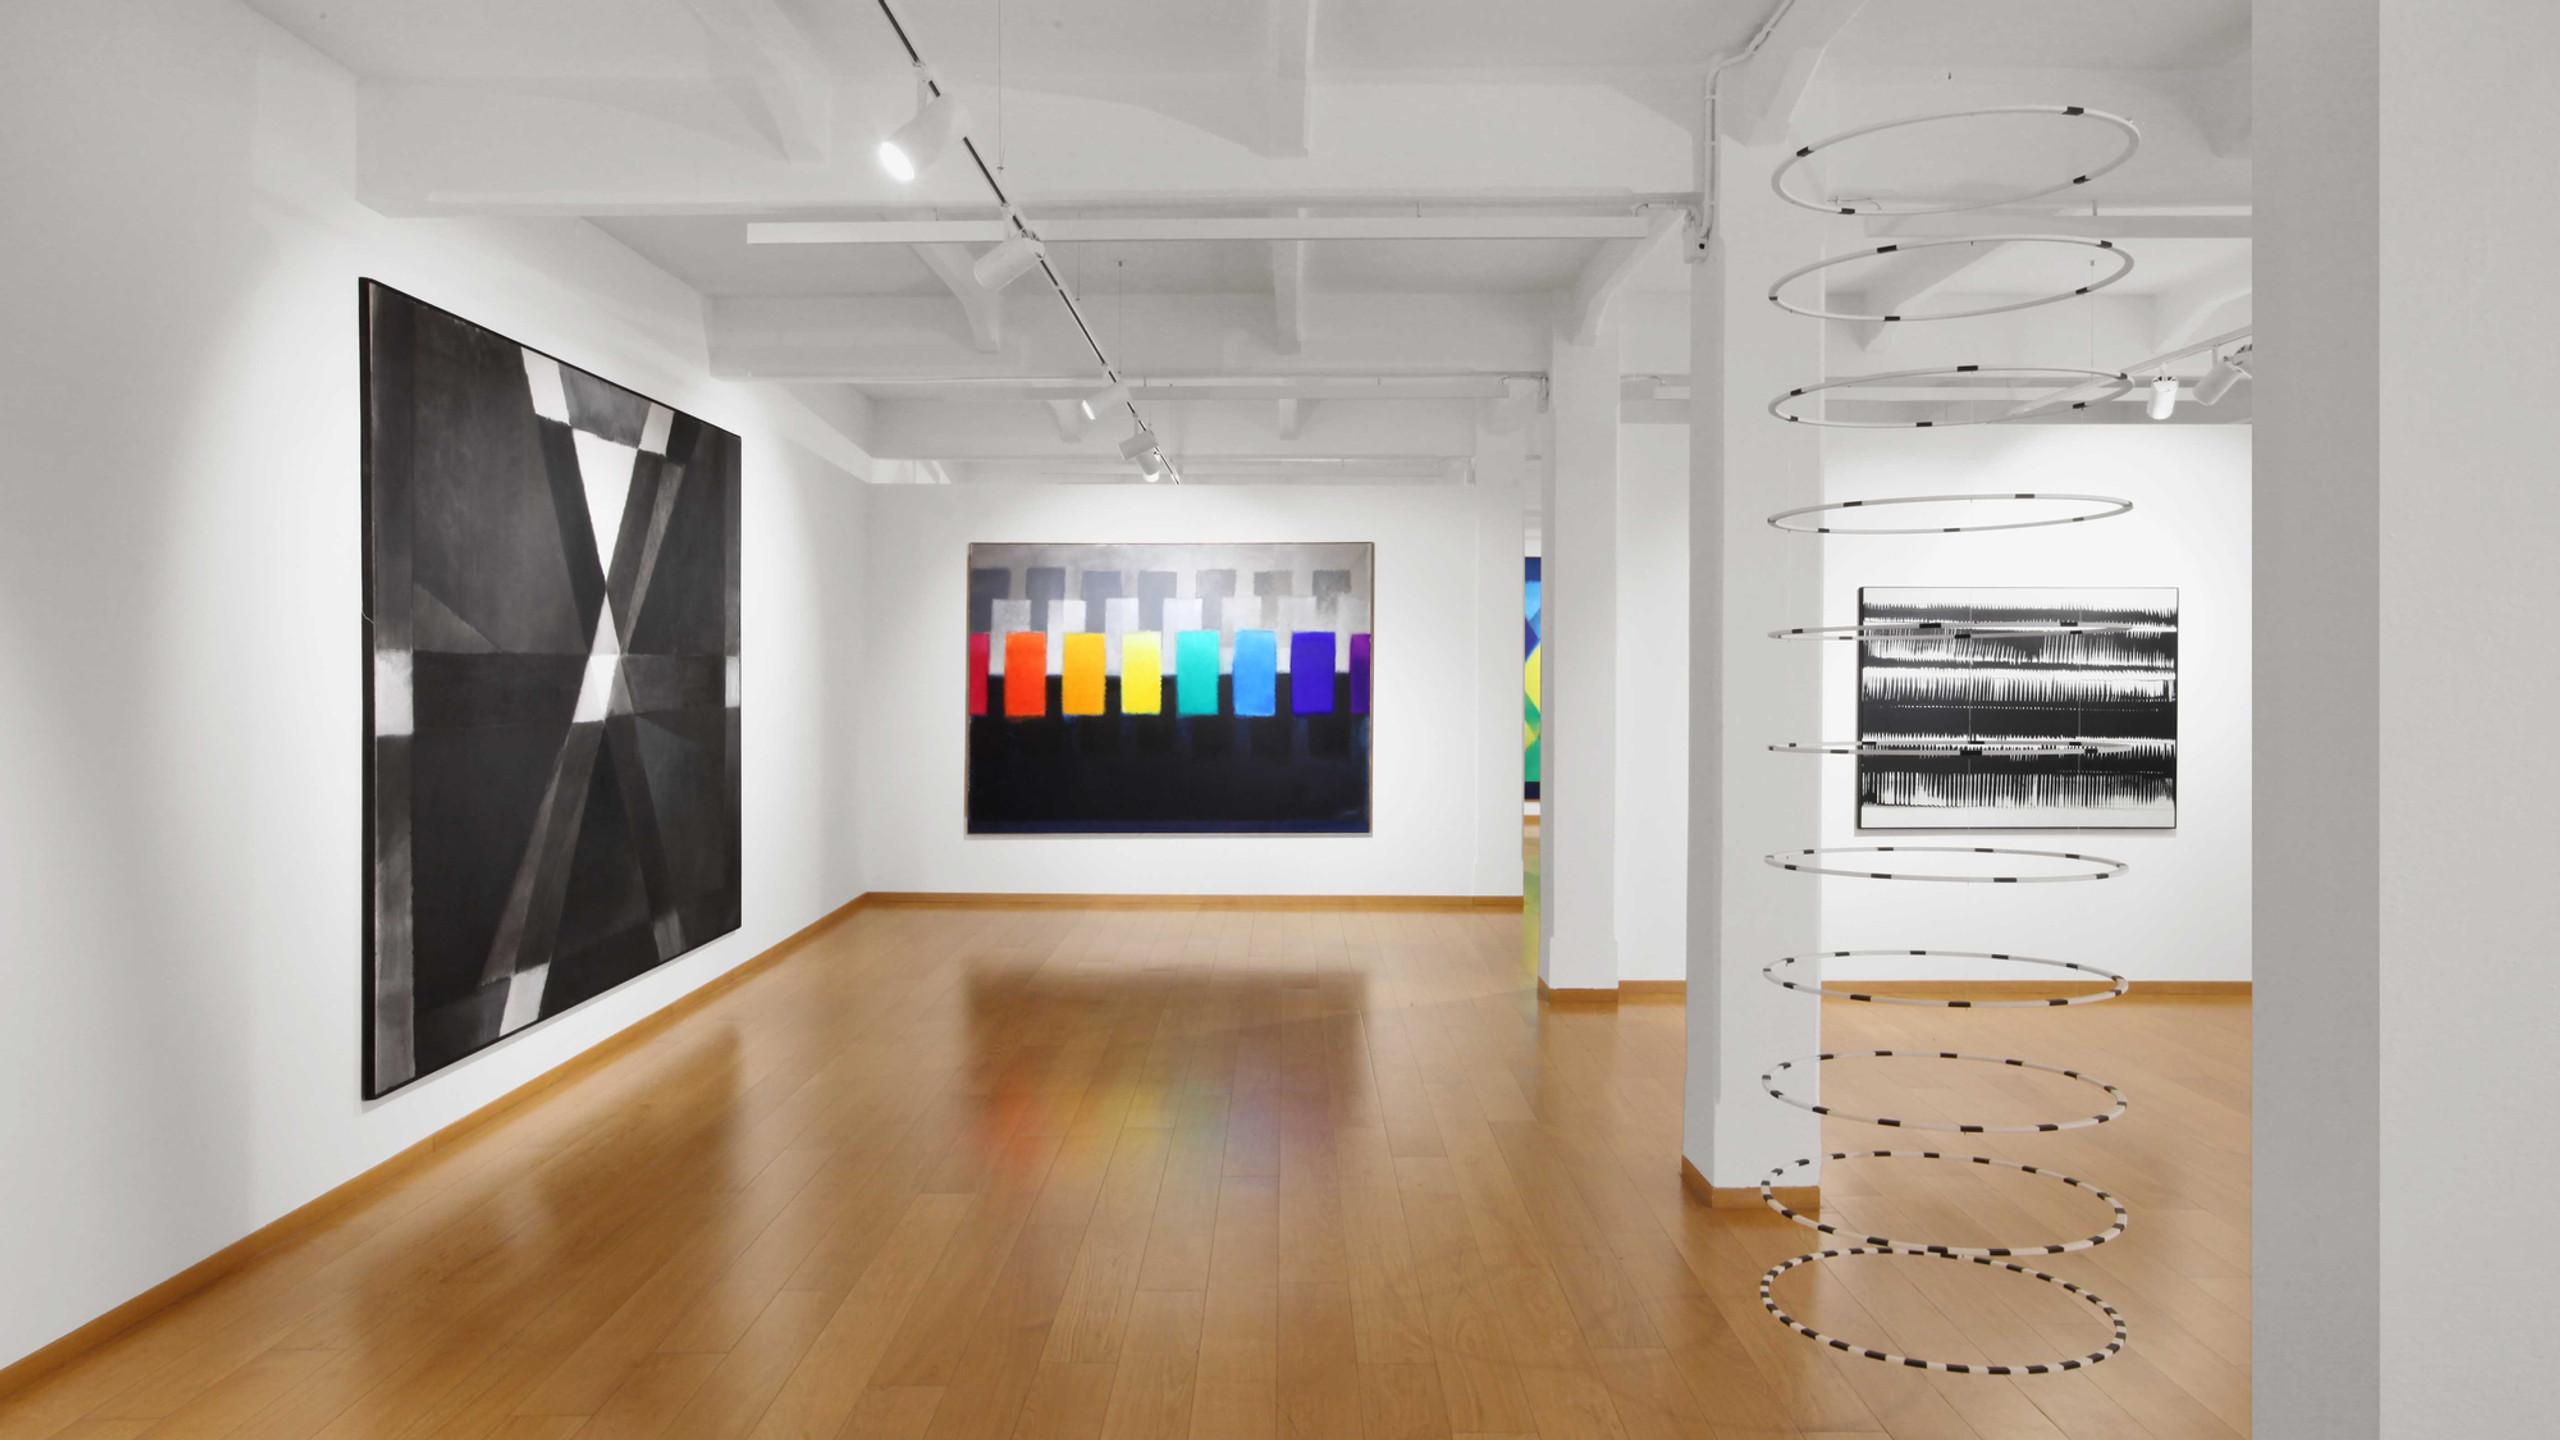 "Installation View ""Heinz Mack: The Breath of Light"", 2019, Cortesi Gallery Milan, Italy - Photo by Bruno Bani © Cortesi Gallery"